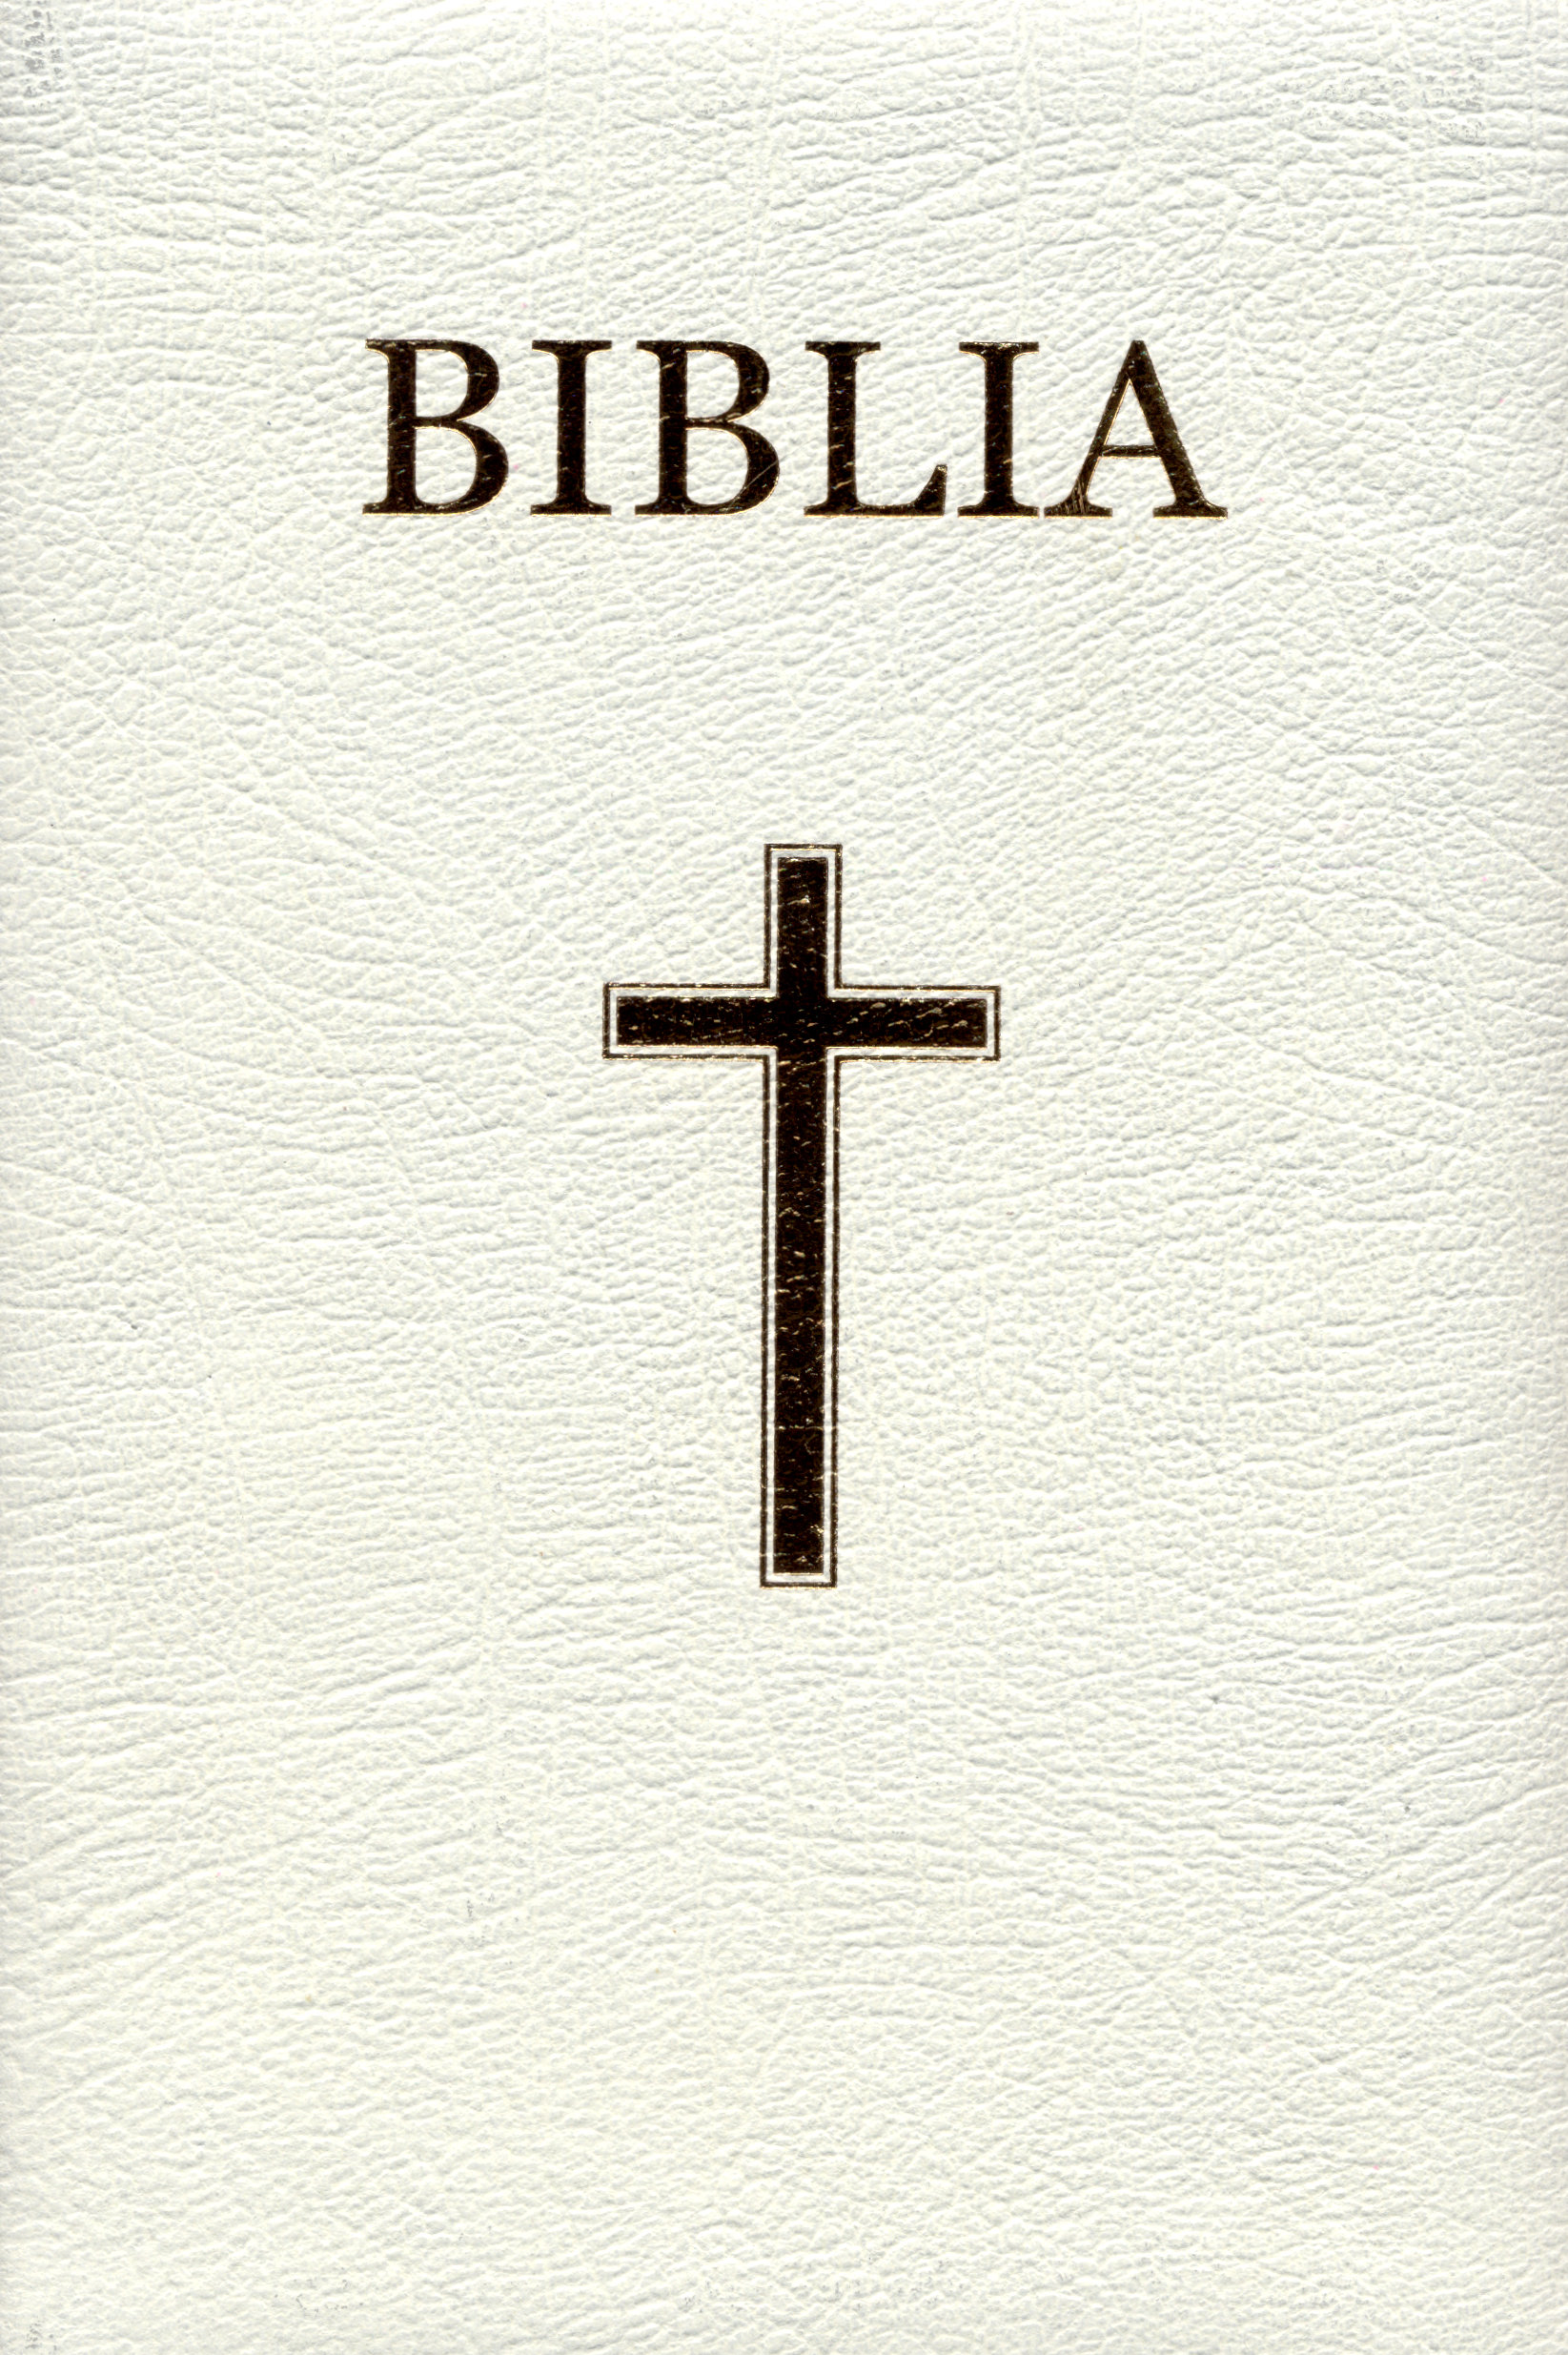 Biblia - medie 2, coperta piele, aurita, index, alba